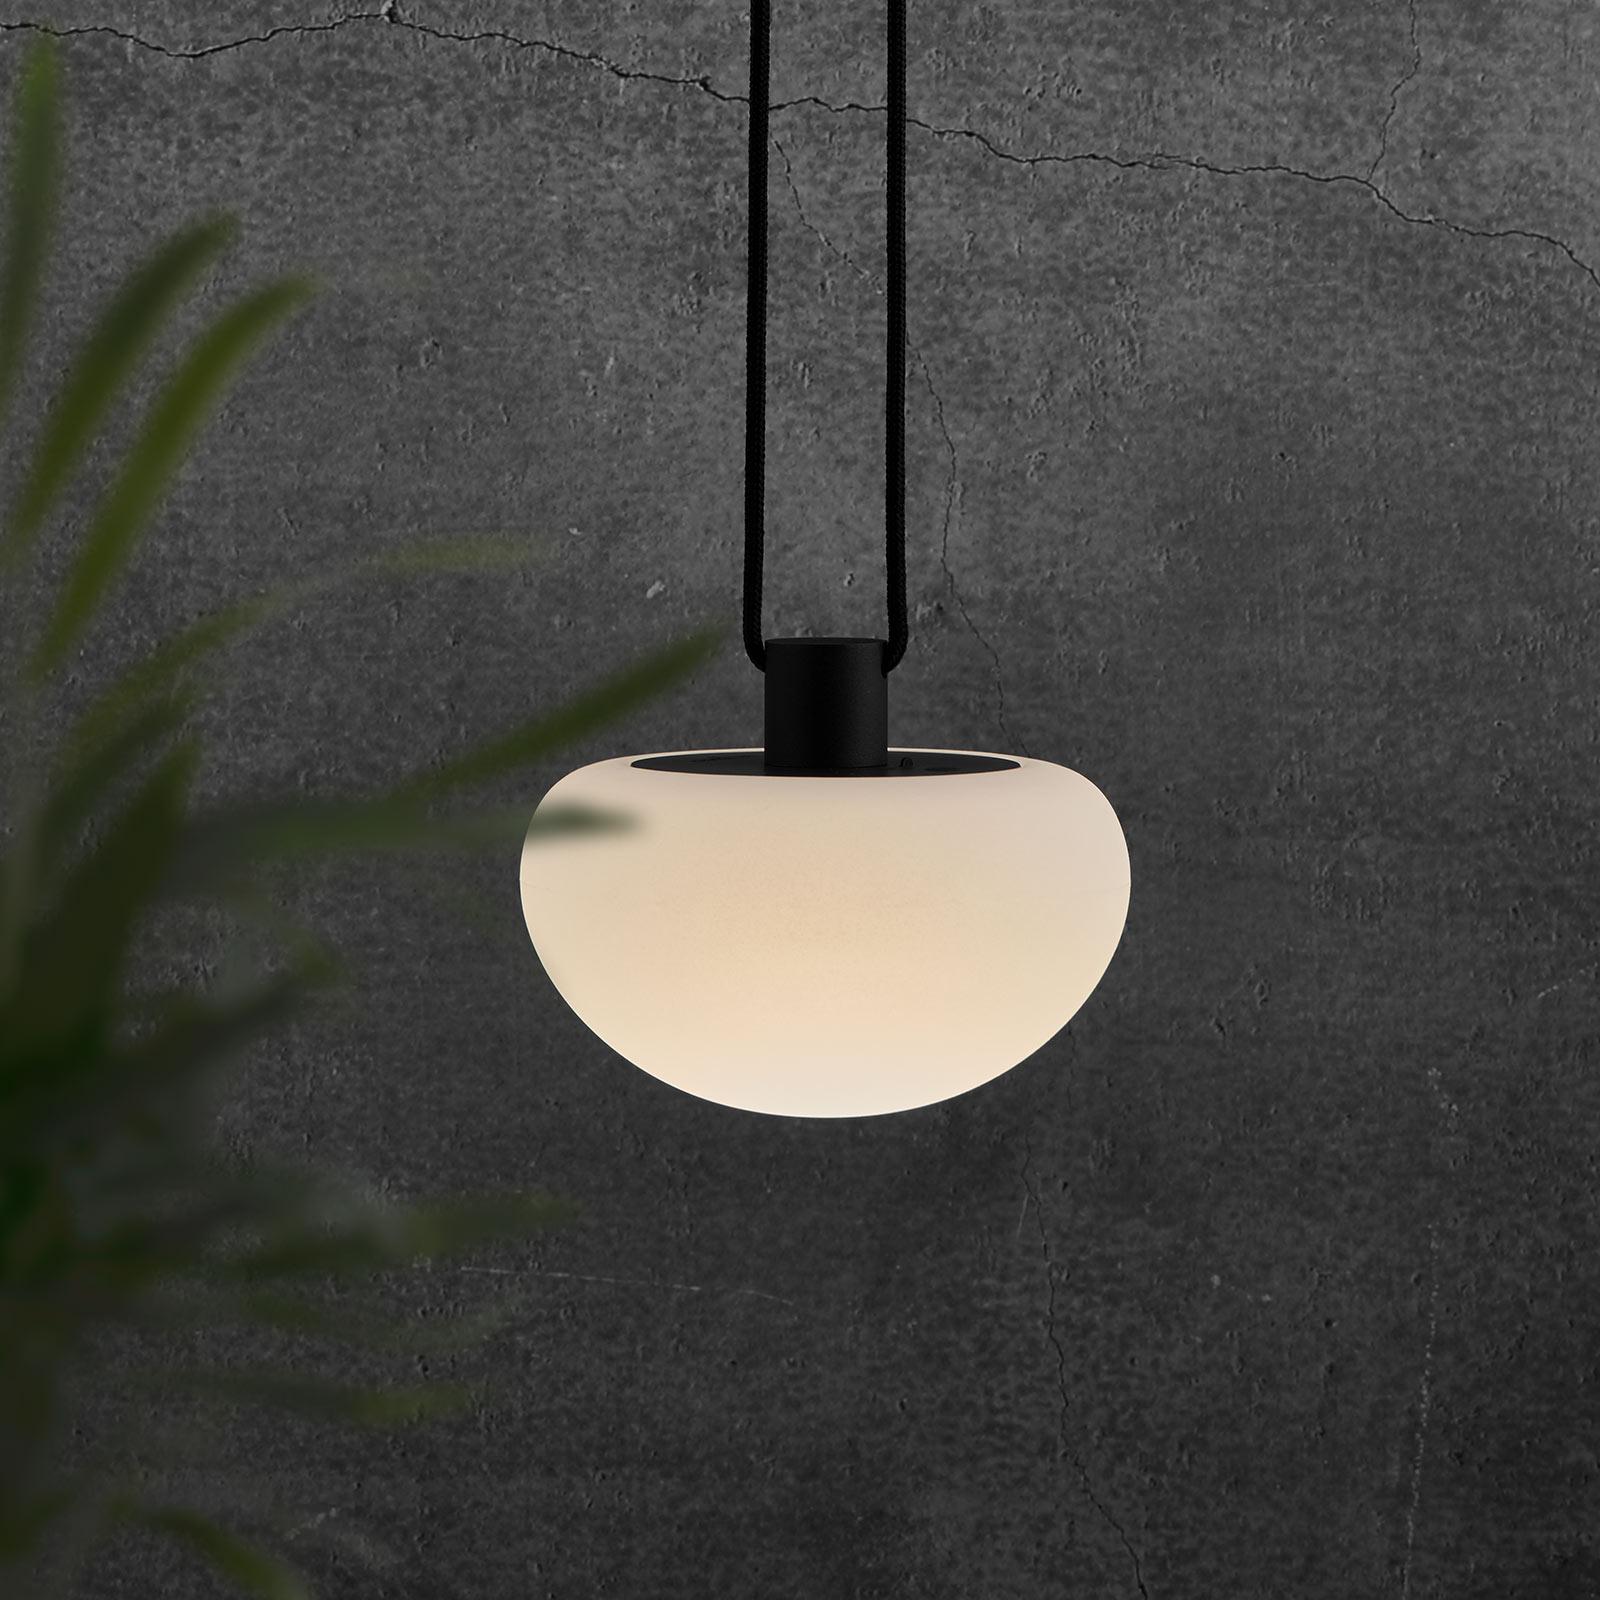 Sponge pendant LED-dekorationslampe med batteri